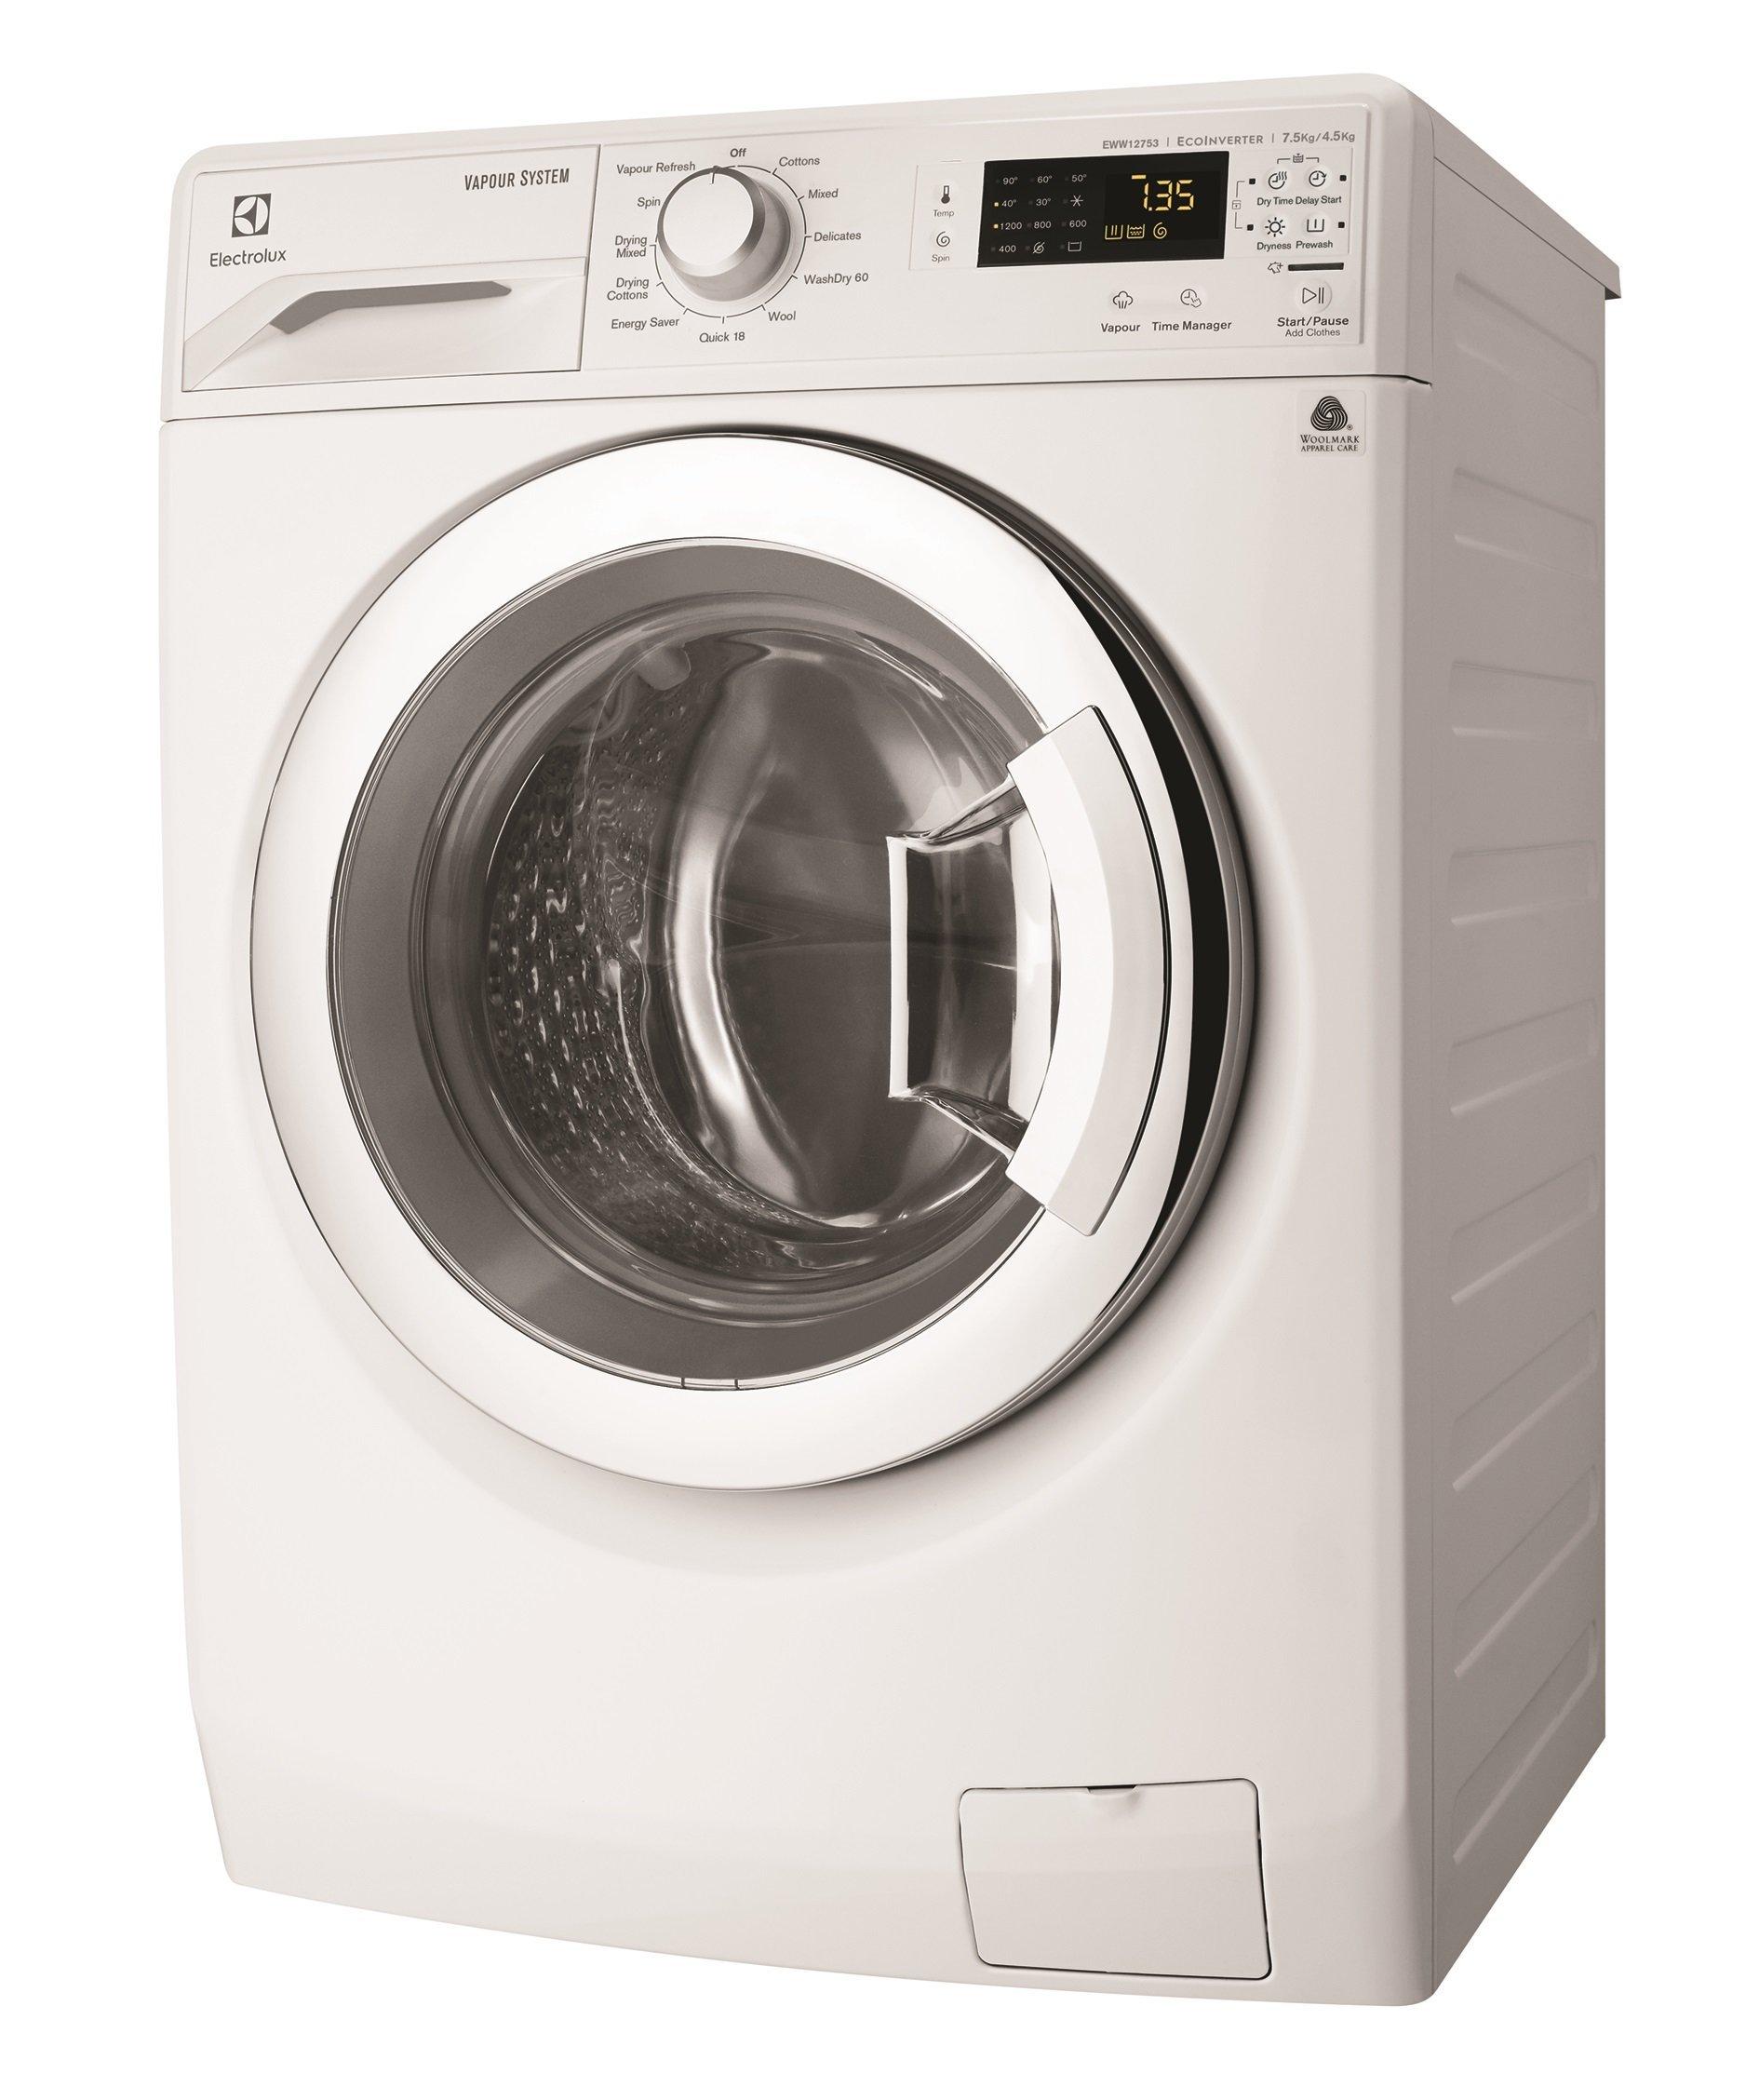 New Electrolux Eww12753 7 5kg Washer 4 5kg Dryer Combo Ebay